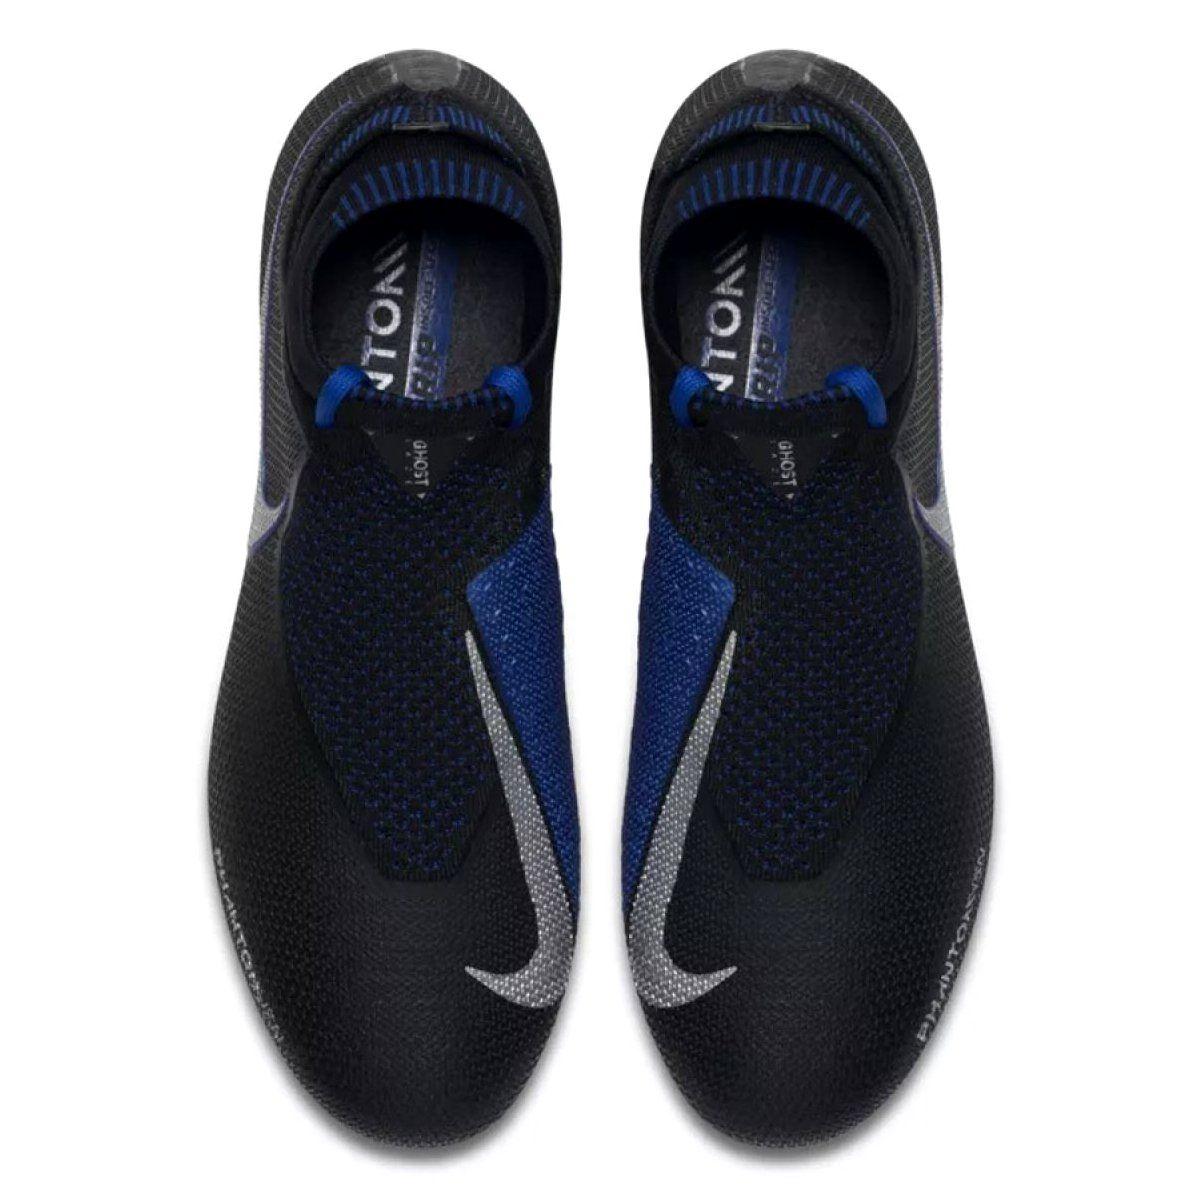 Buty Pilkarskie Nike Phantom Vsn Elite Df Sg Pro Ac M Ao3264 004 Czarne Czarne Football Boots Black Boots Football Shoes